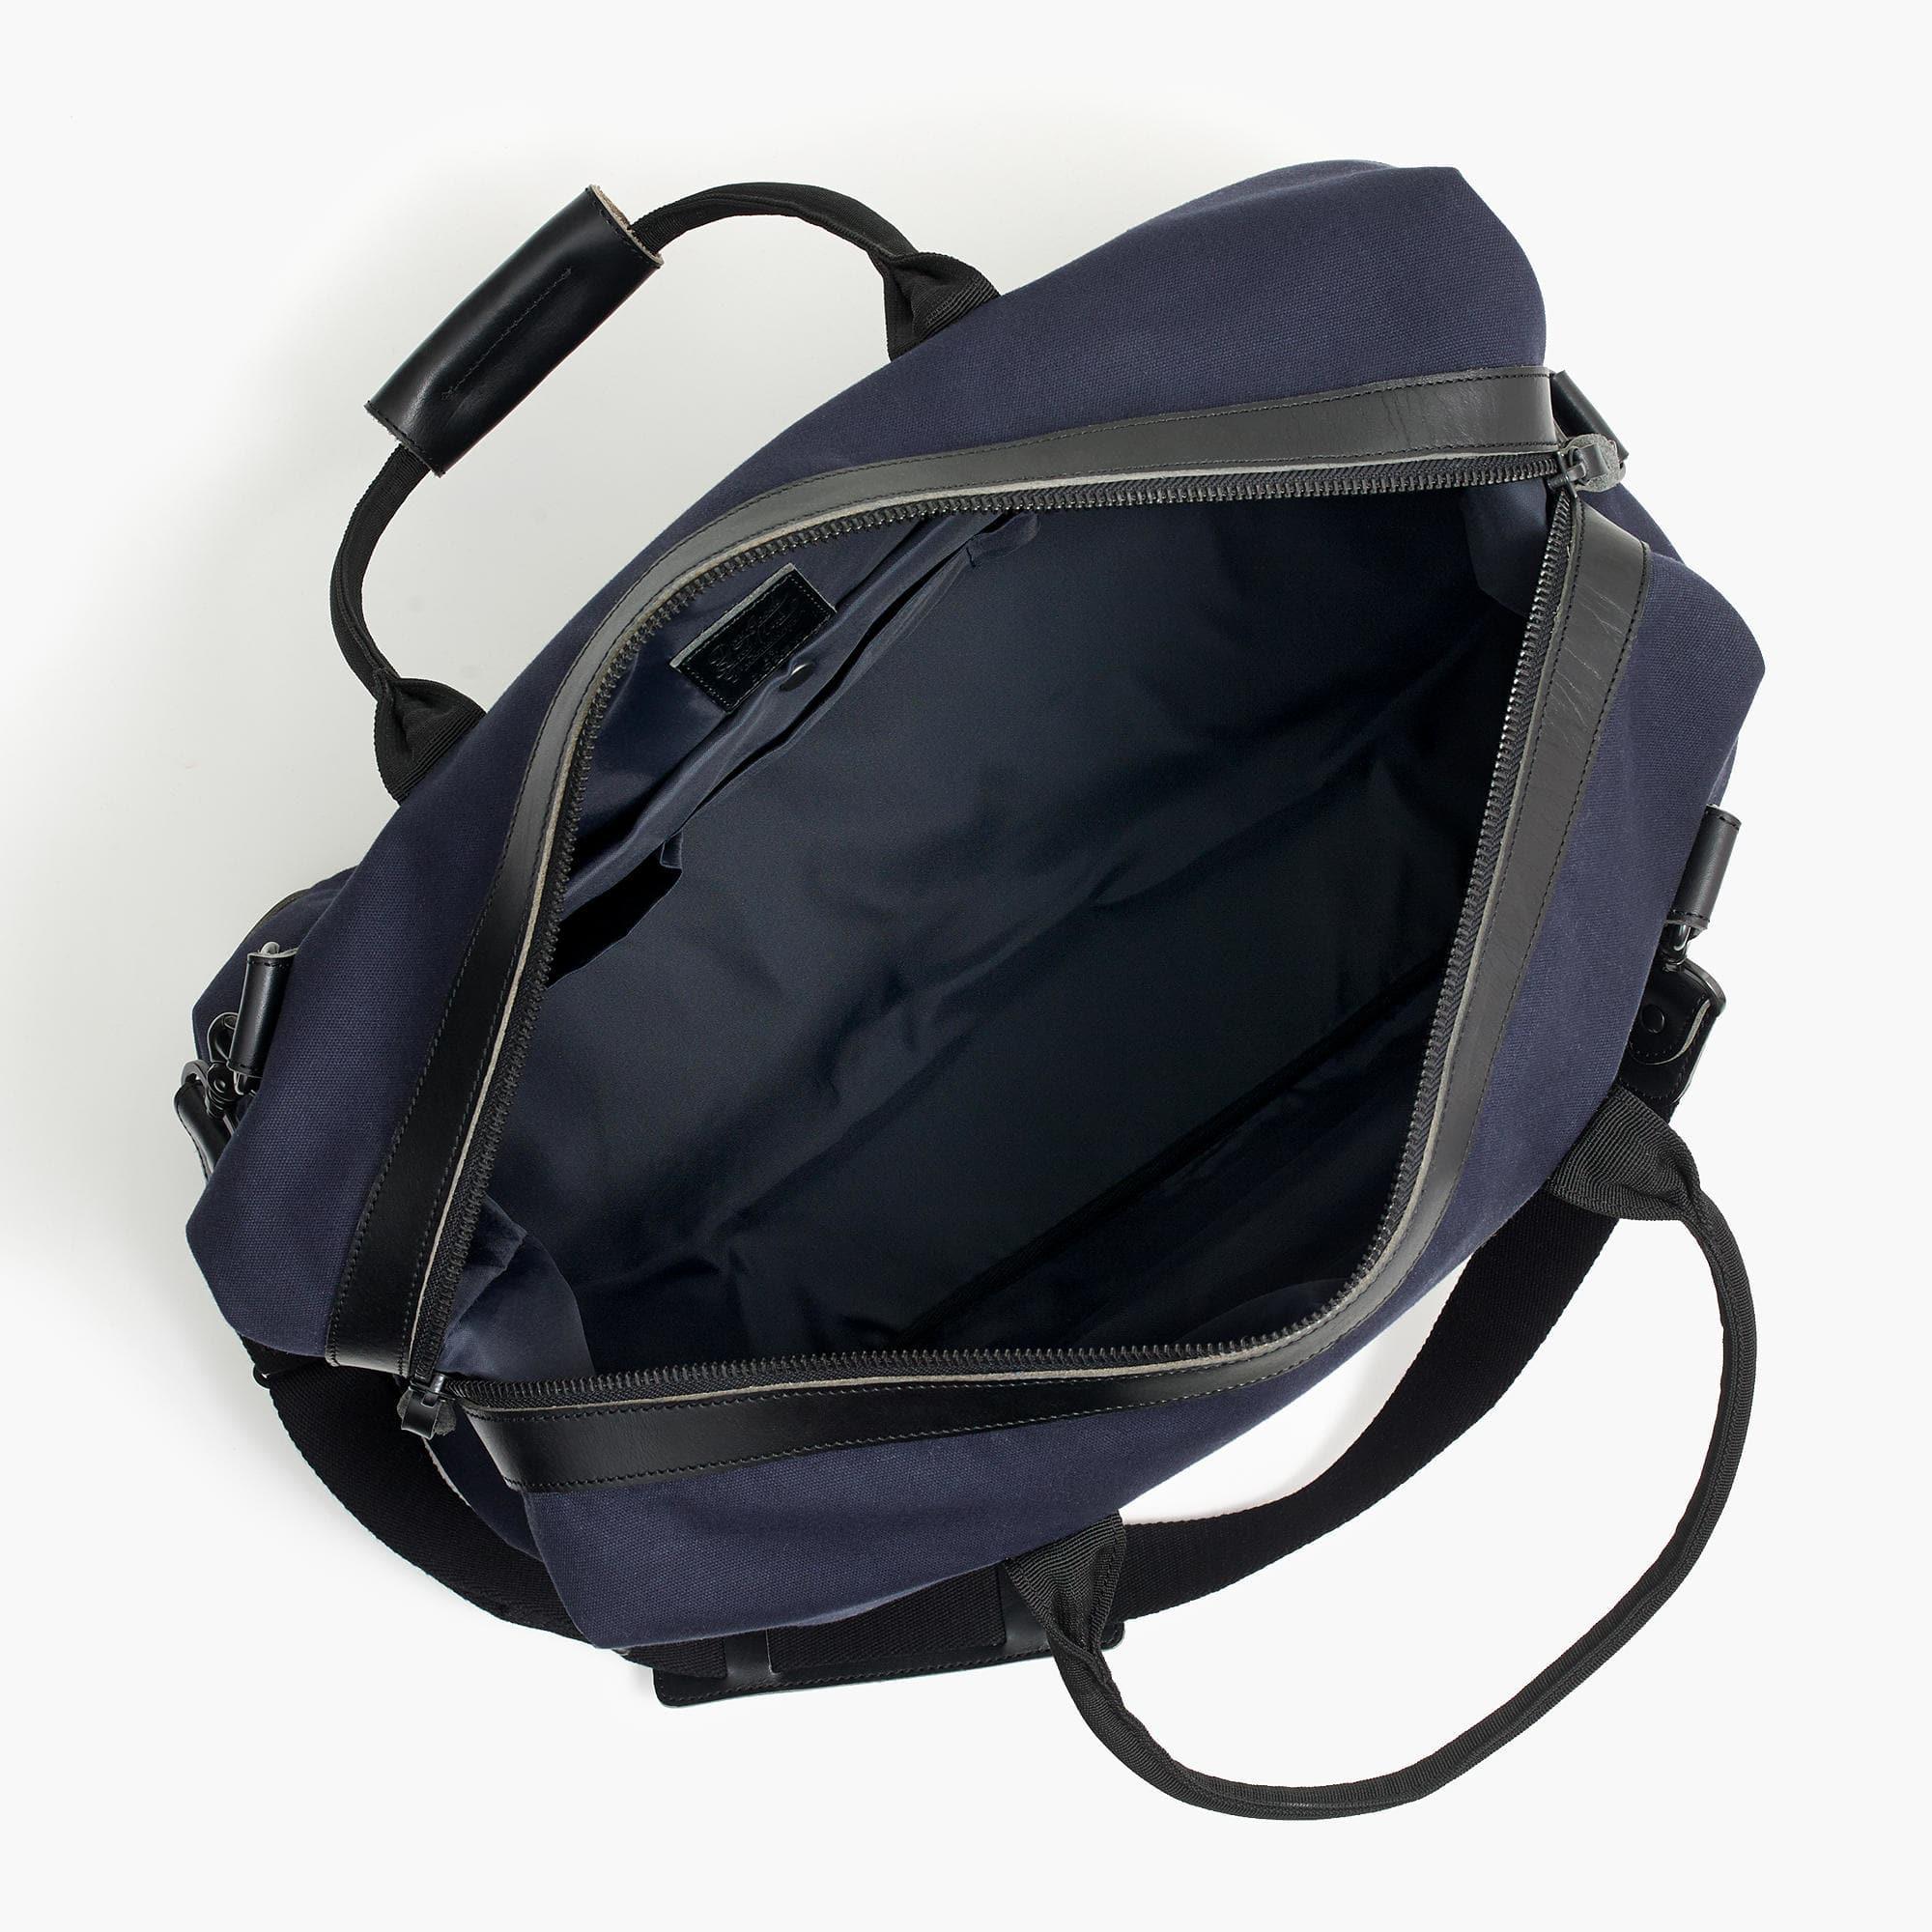 b64b43ec18 Lyst - J.Crew Ludlow Weekender Bag in Blue for Men